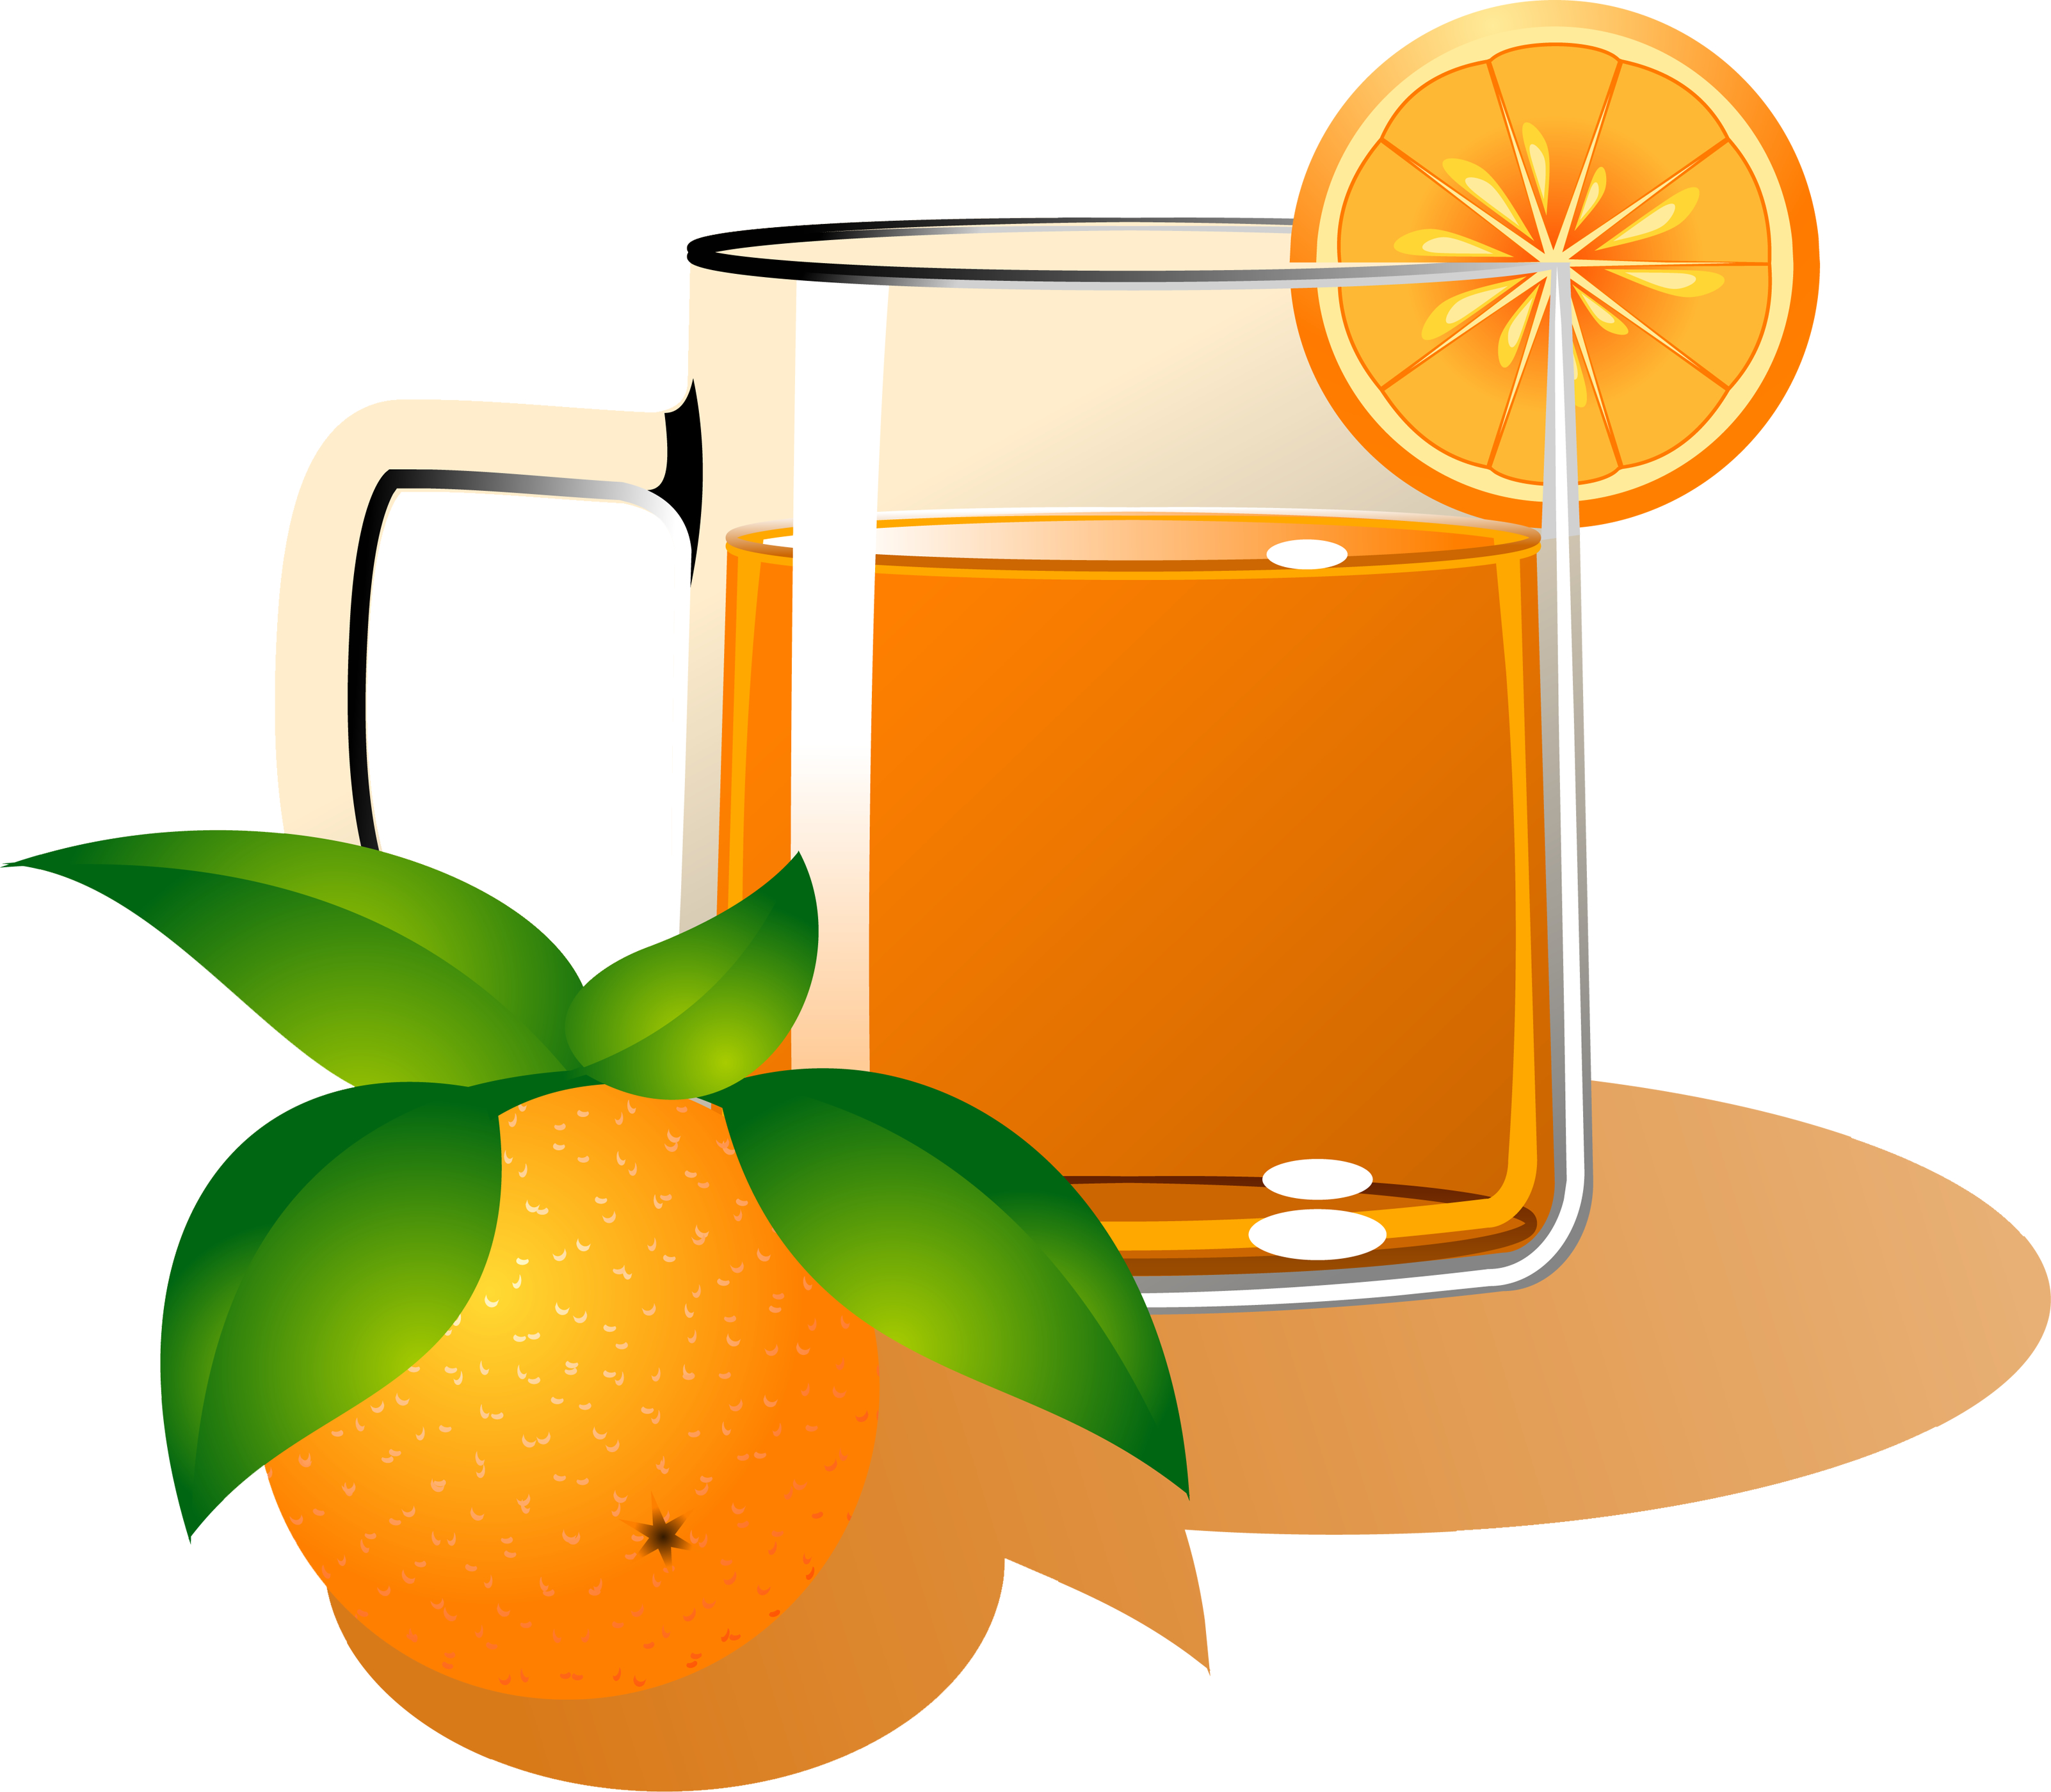 Juice Clipart-Clipartlook.com - Juice Clipart